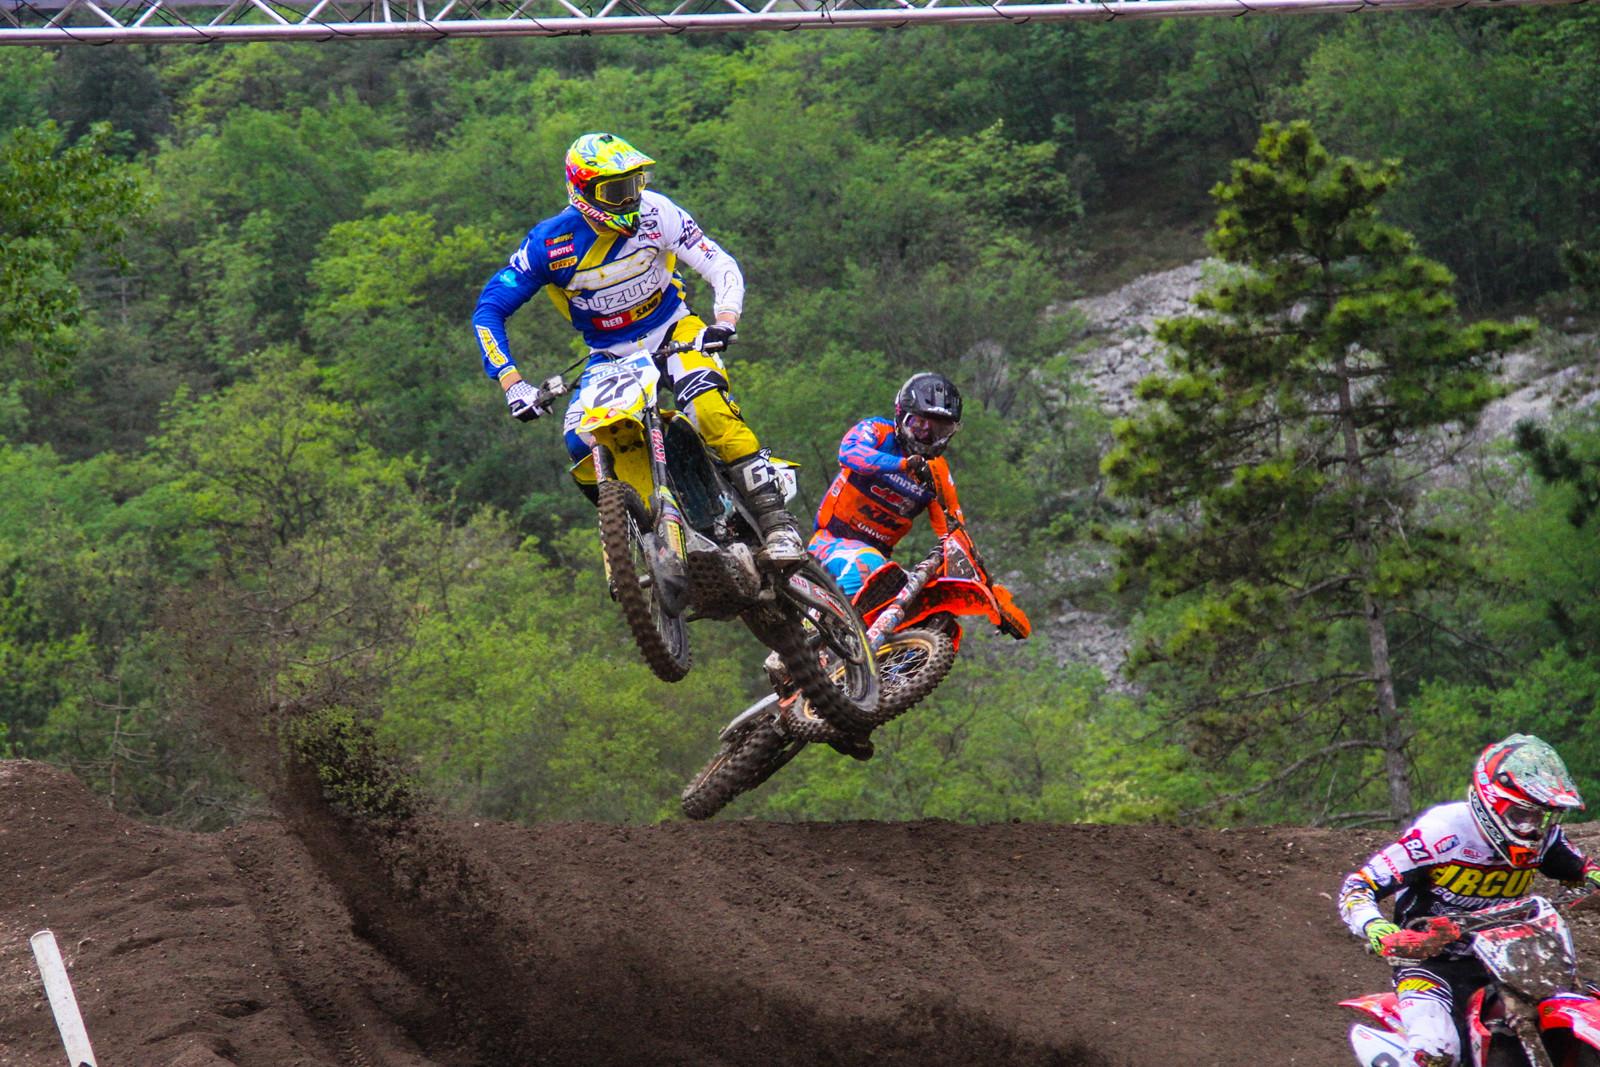 Arminas Jasikonis - Photo Blast: 2017 MXGP of Trentino - Motocross Pictures - Vital MX